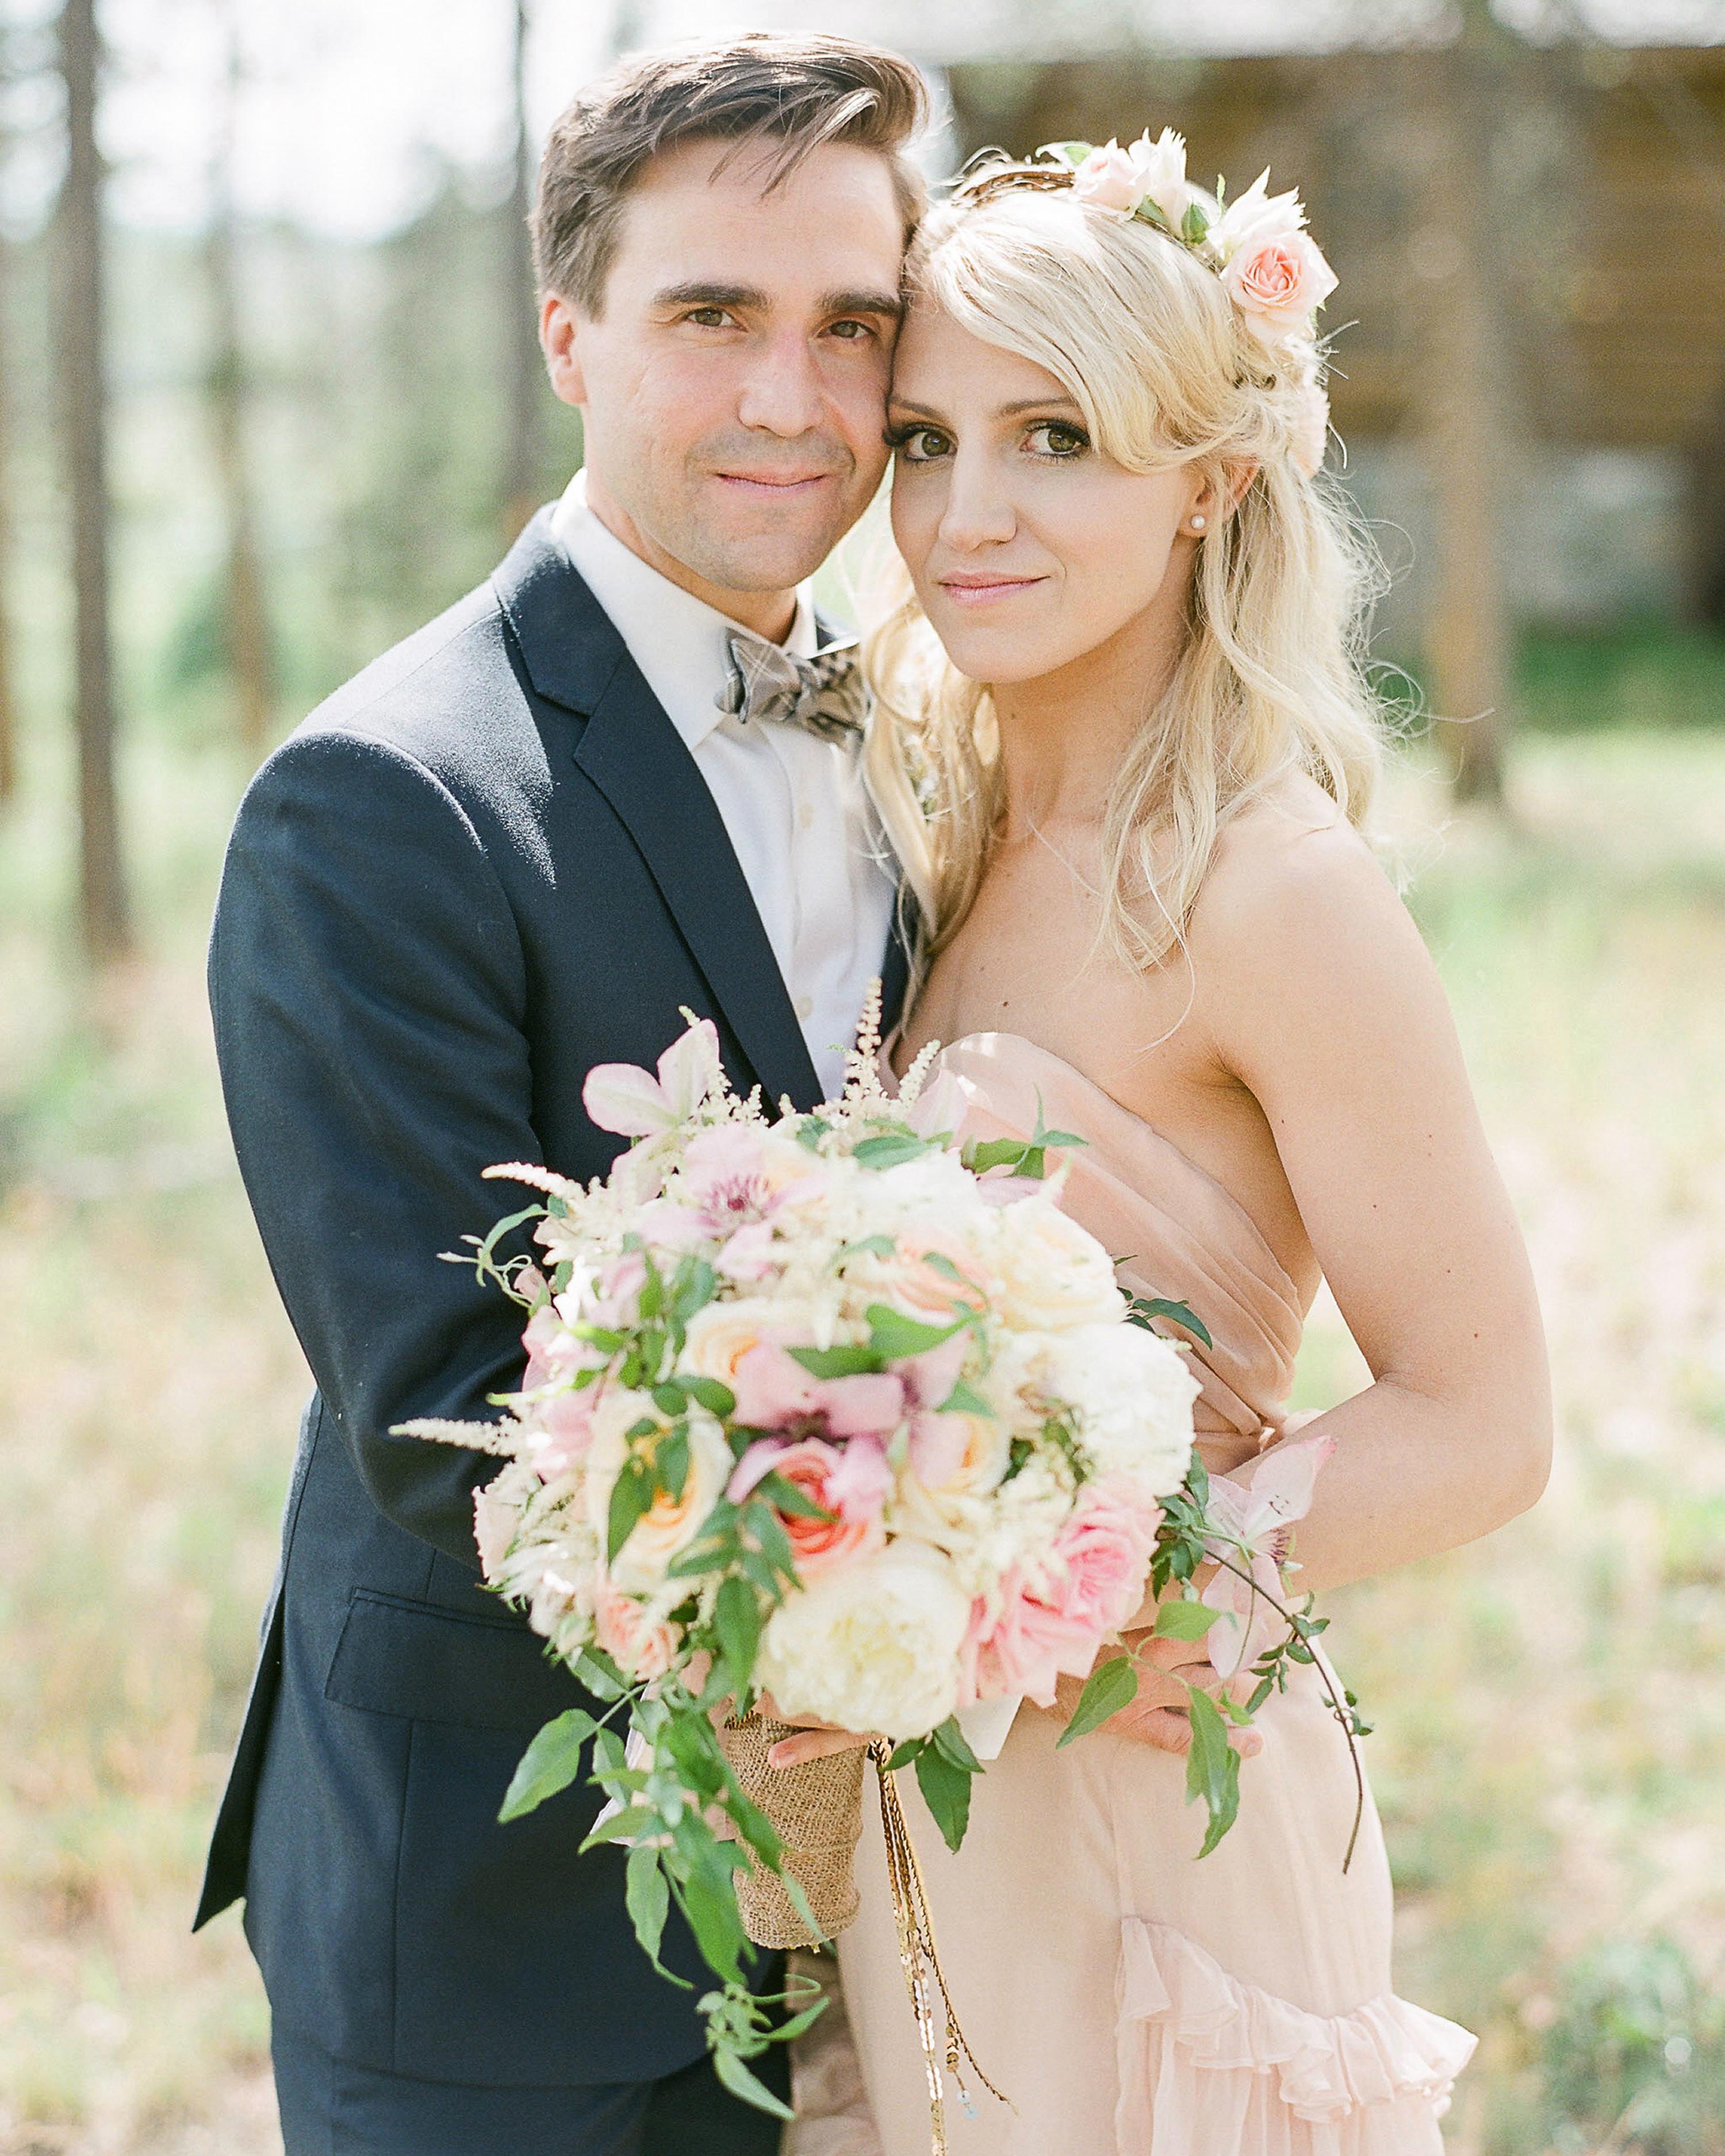 Martha Stewart Weddings: A Rustic Outdoor Destination Wedding In Colorado